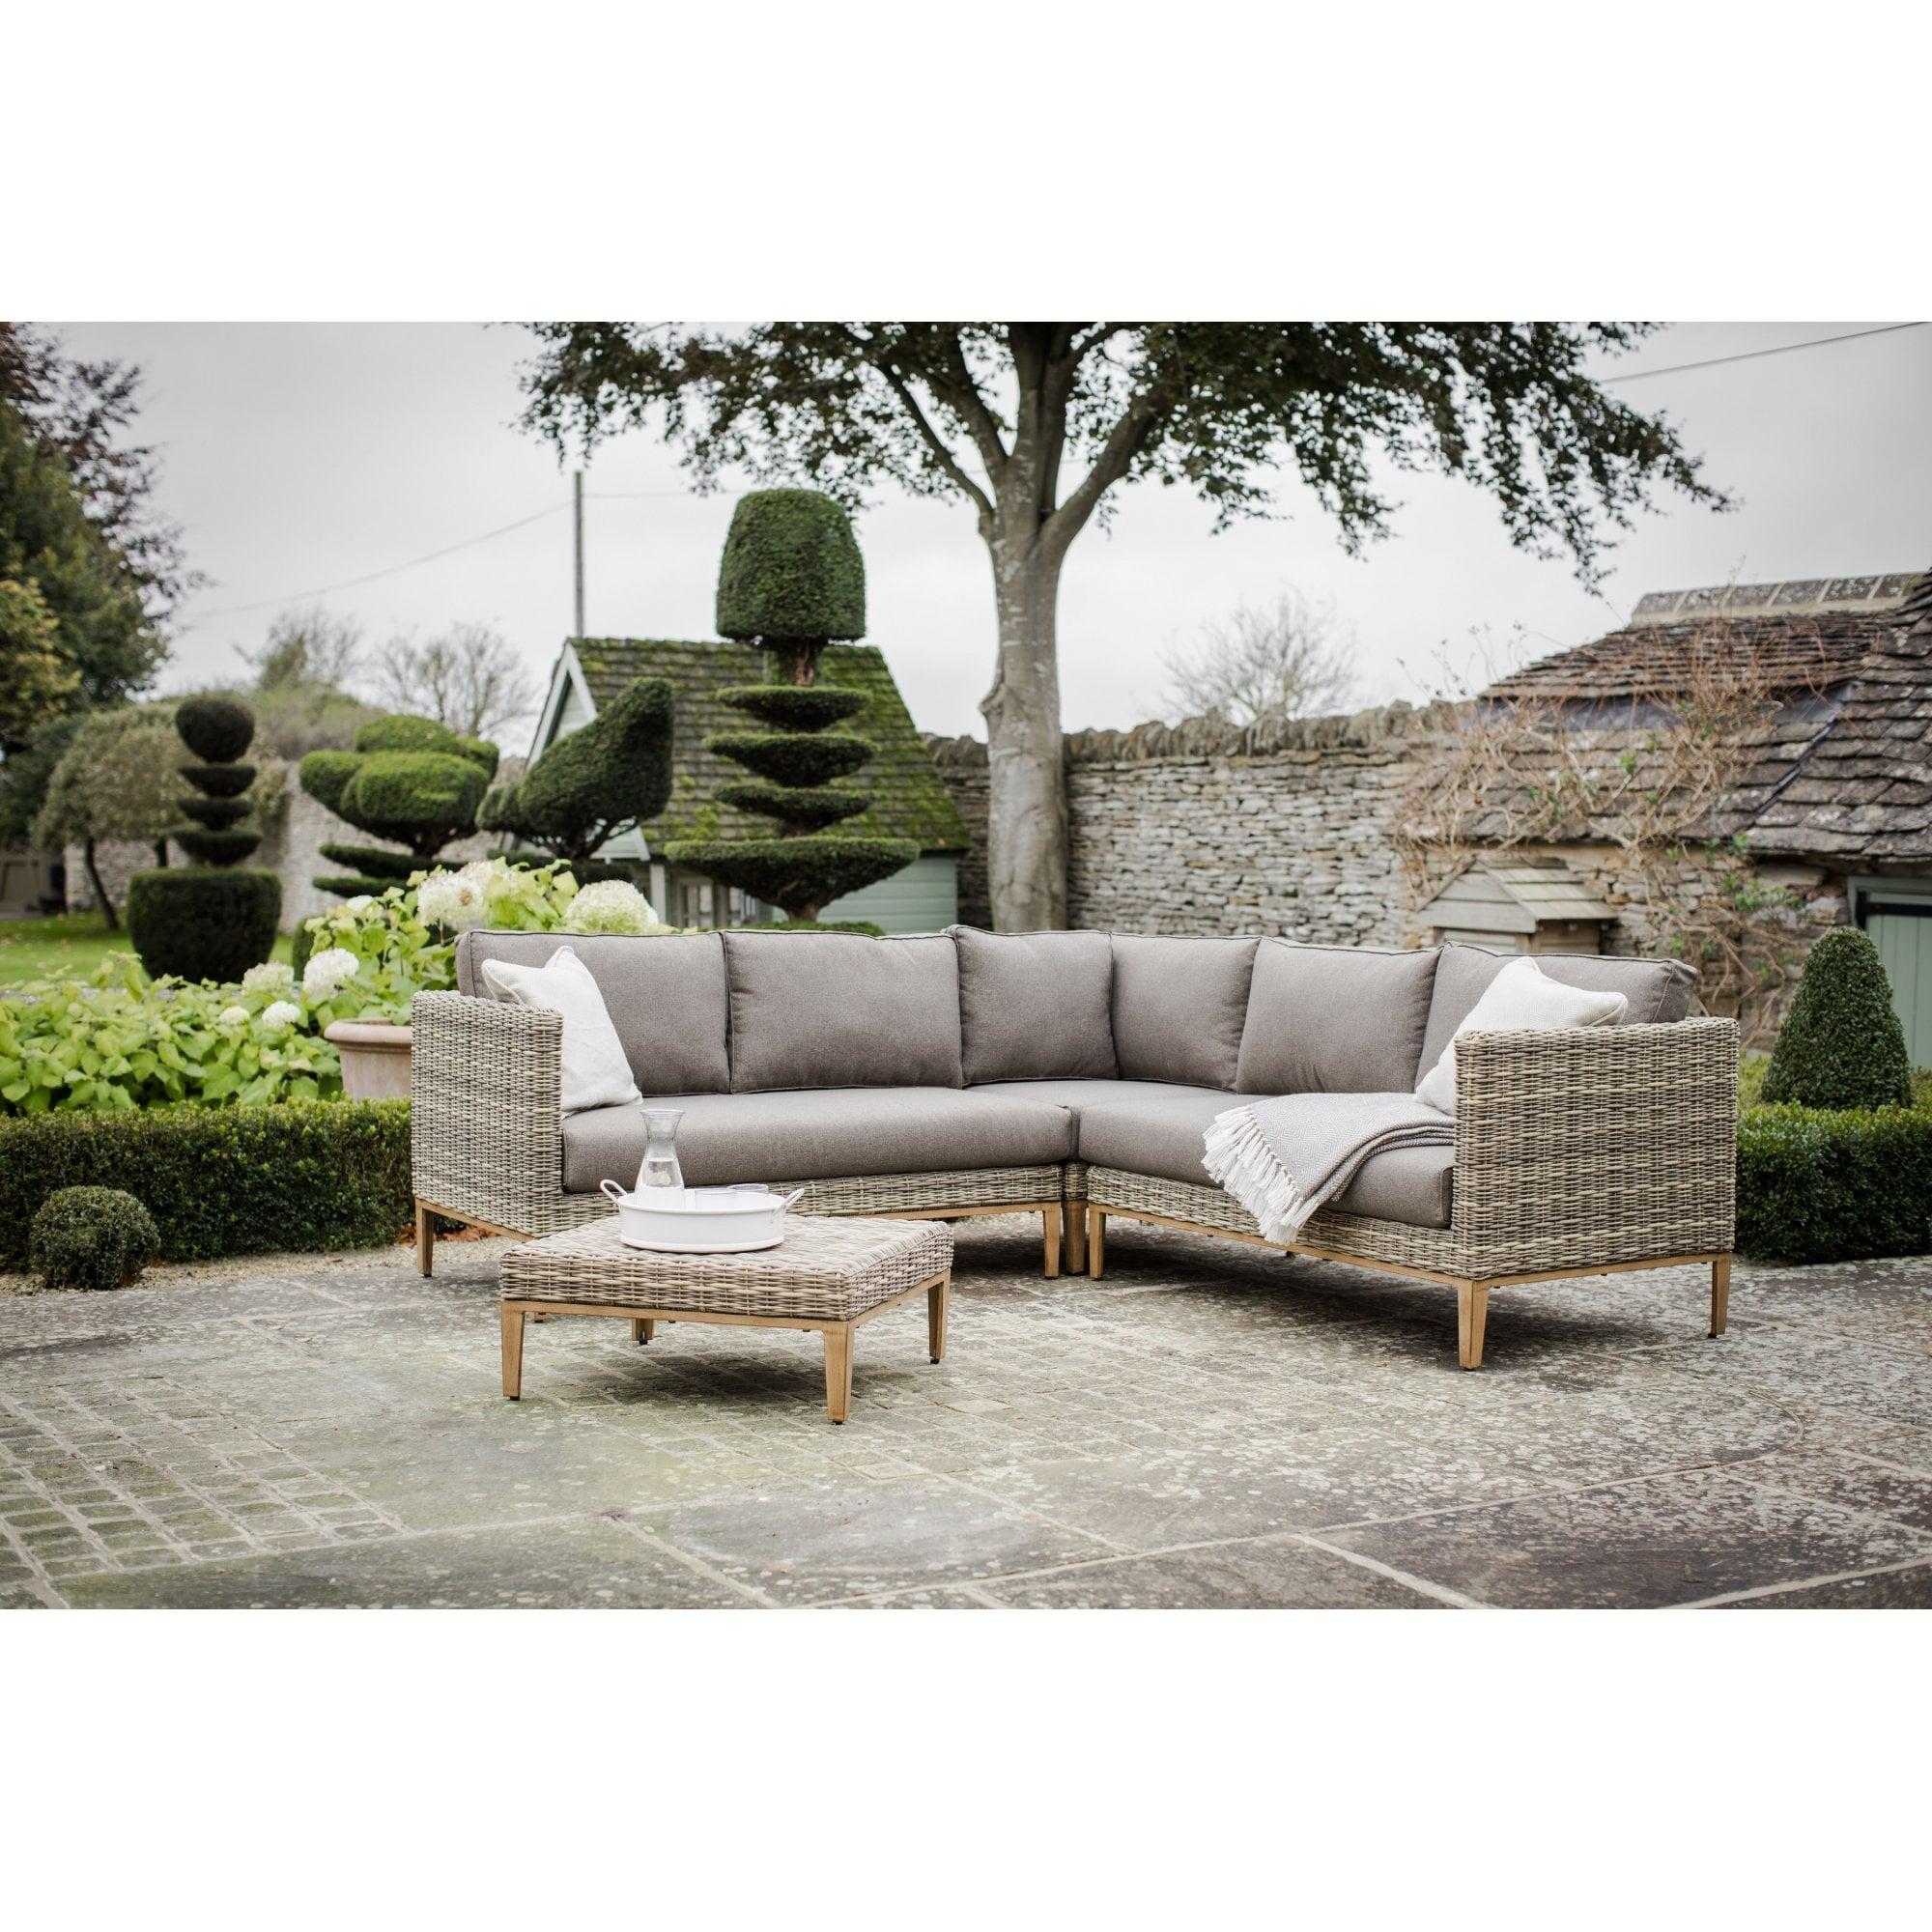 Garden Trading Walderton Corner Sofa Set - All-weather Rattan